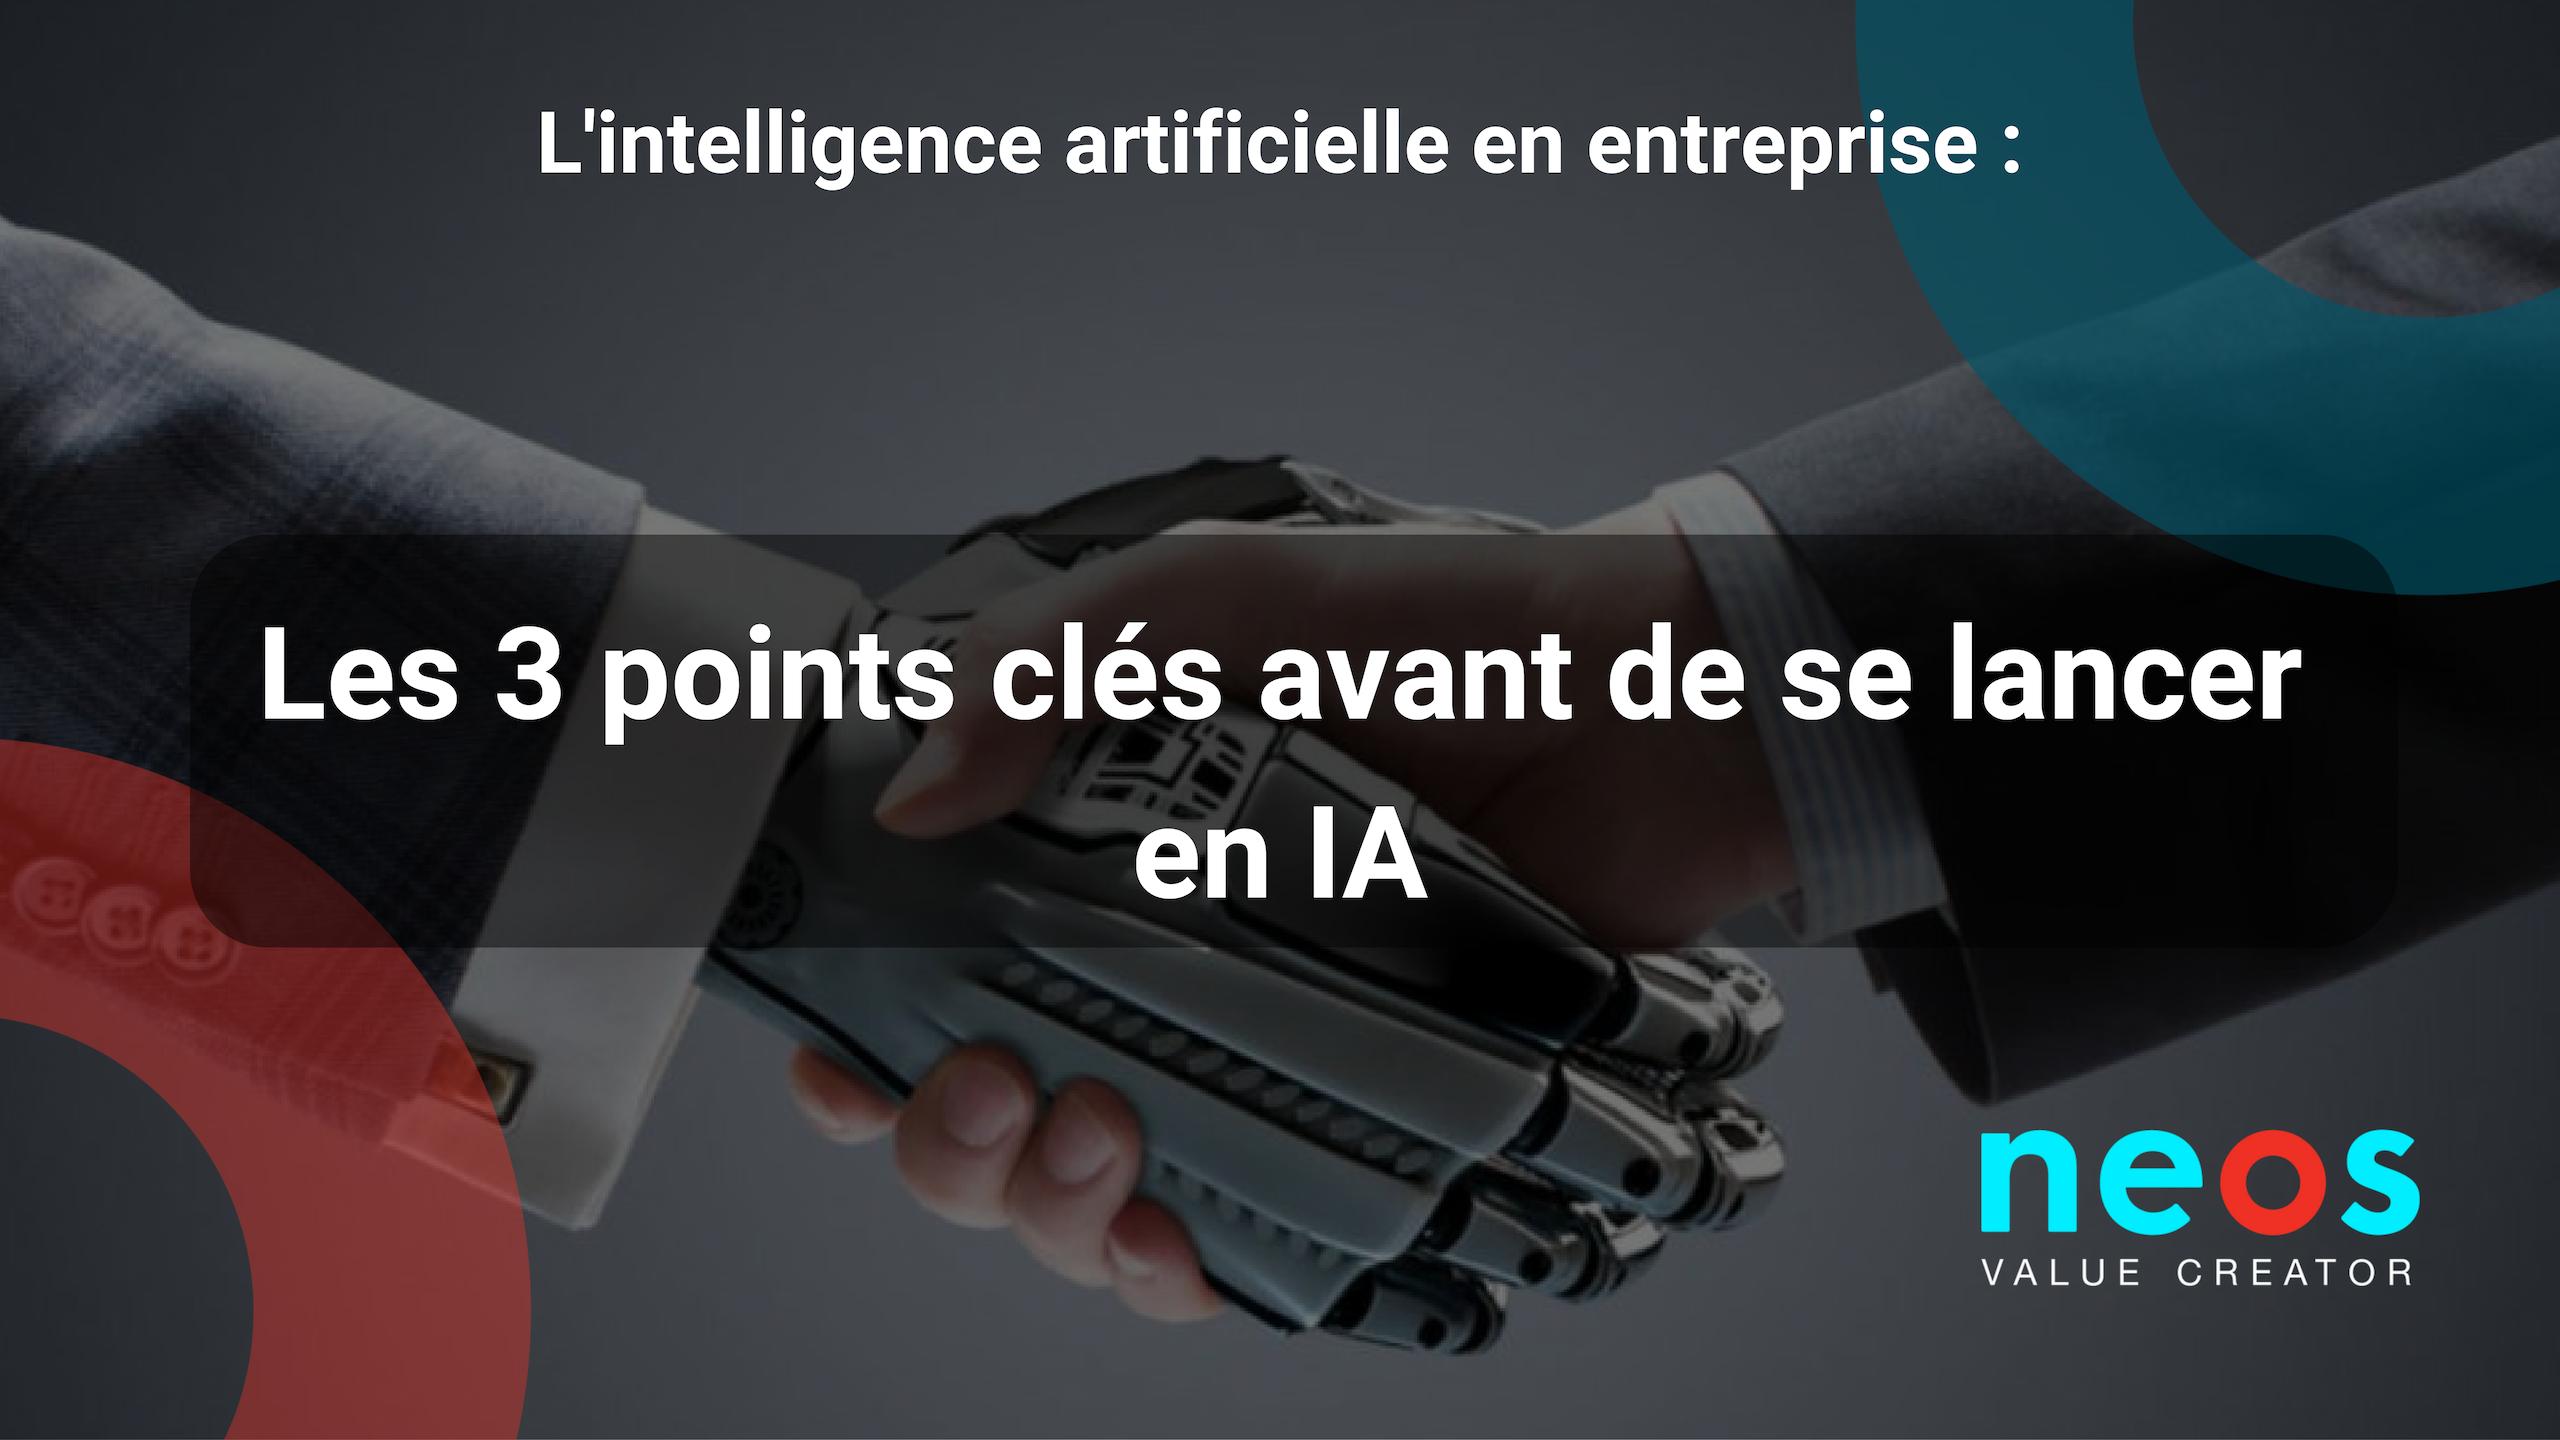 Workshop : Integrating Artificial Intelligence into Businesses